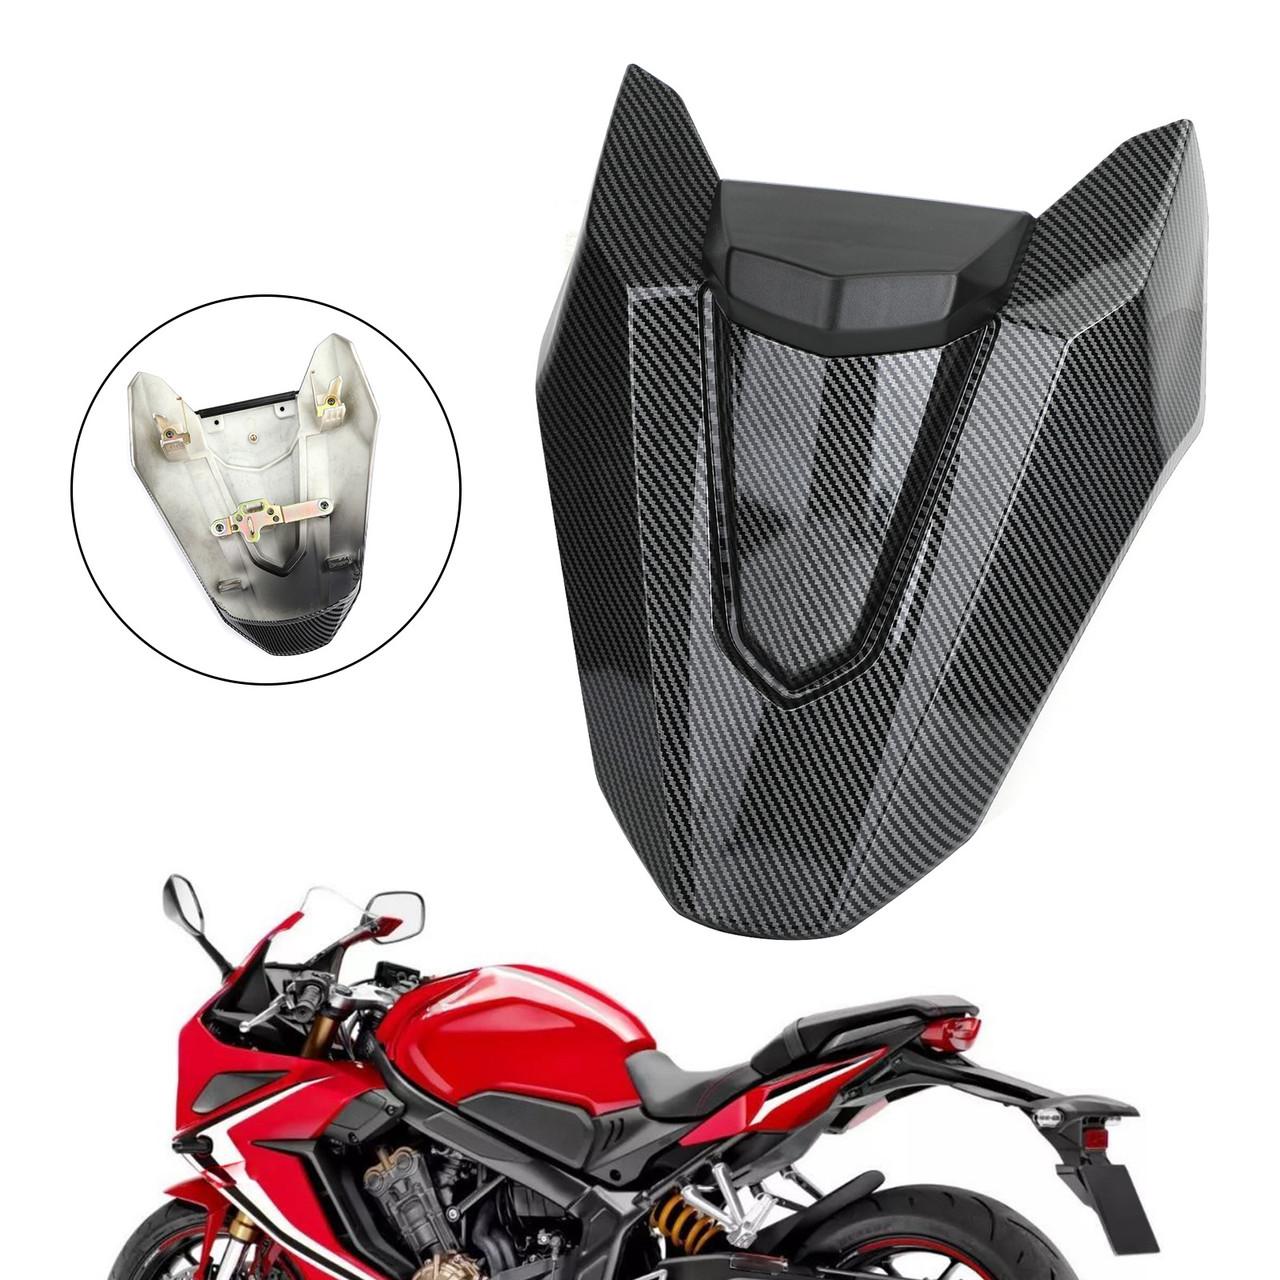 Seat Cover Cowl For Honda CB650R/CBR650R 19-20 Carbon